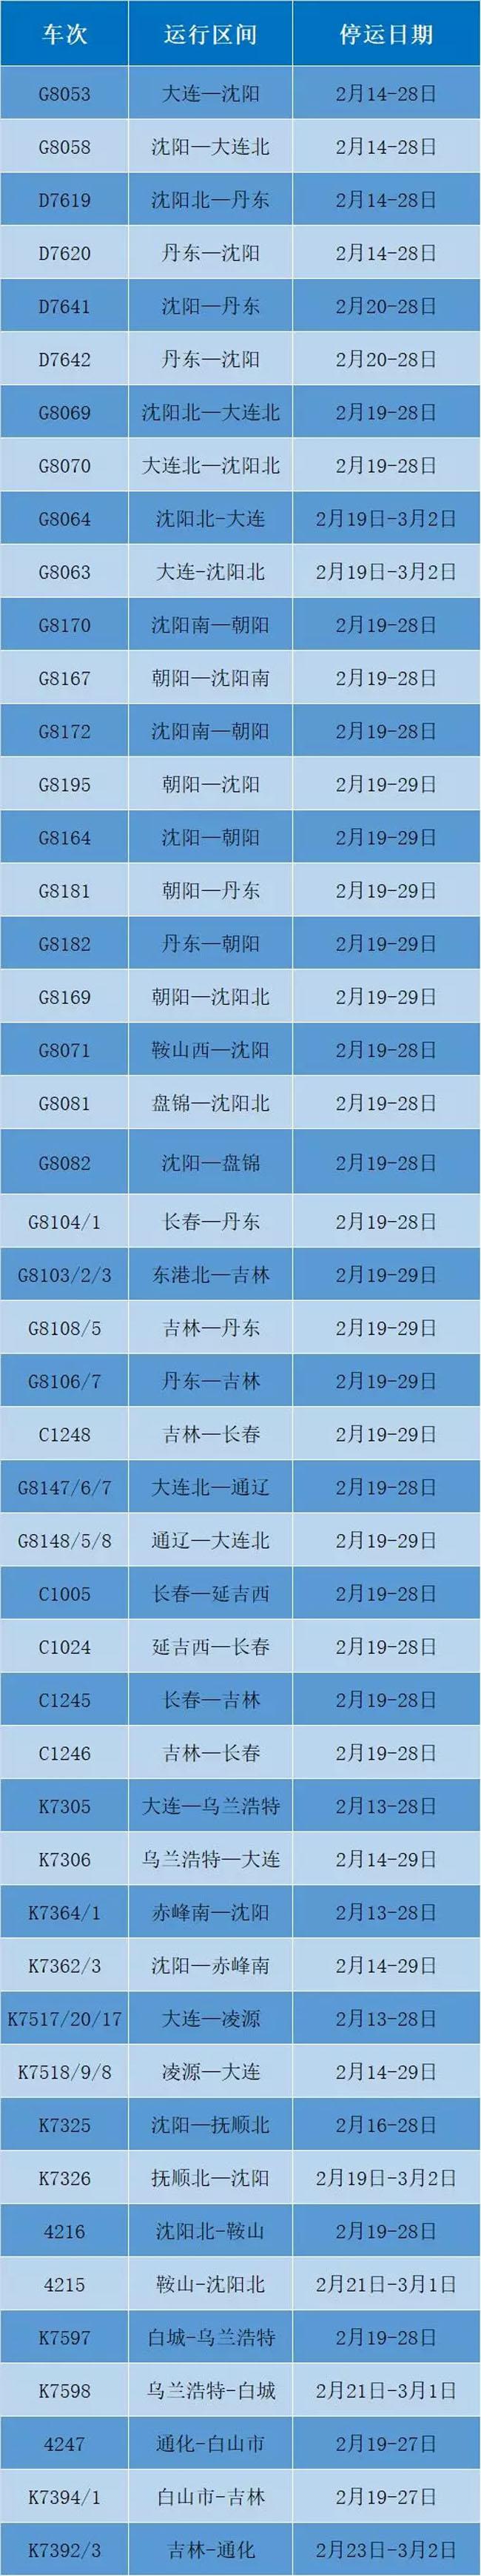 http://www.ycvslh.tw/wenhuayichan/69461.html